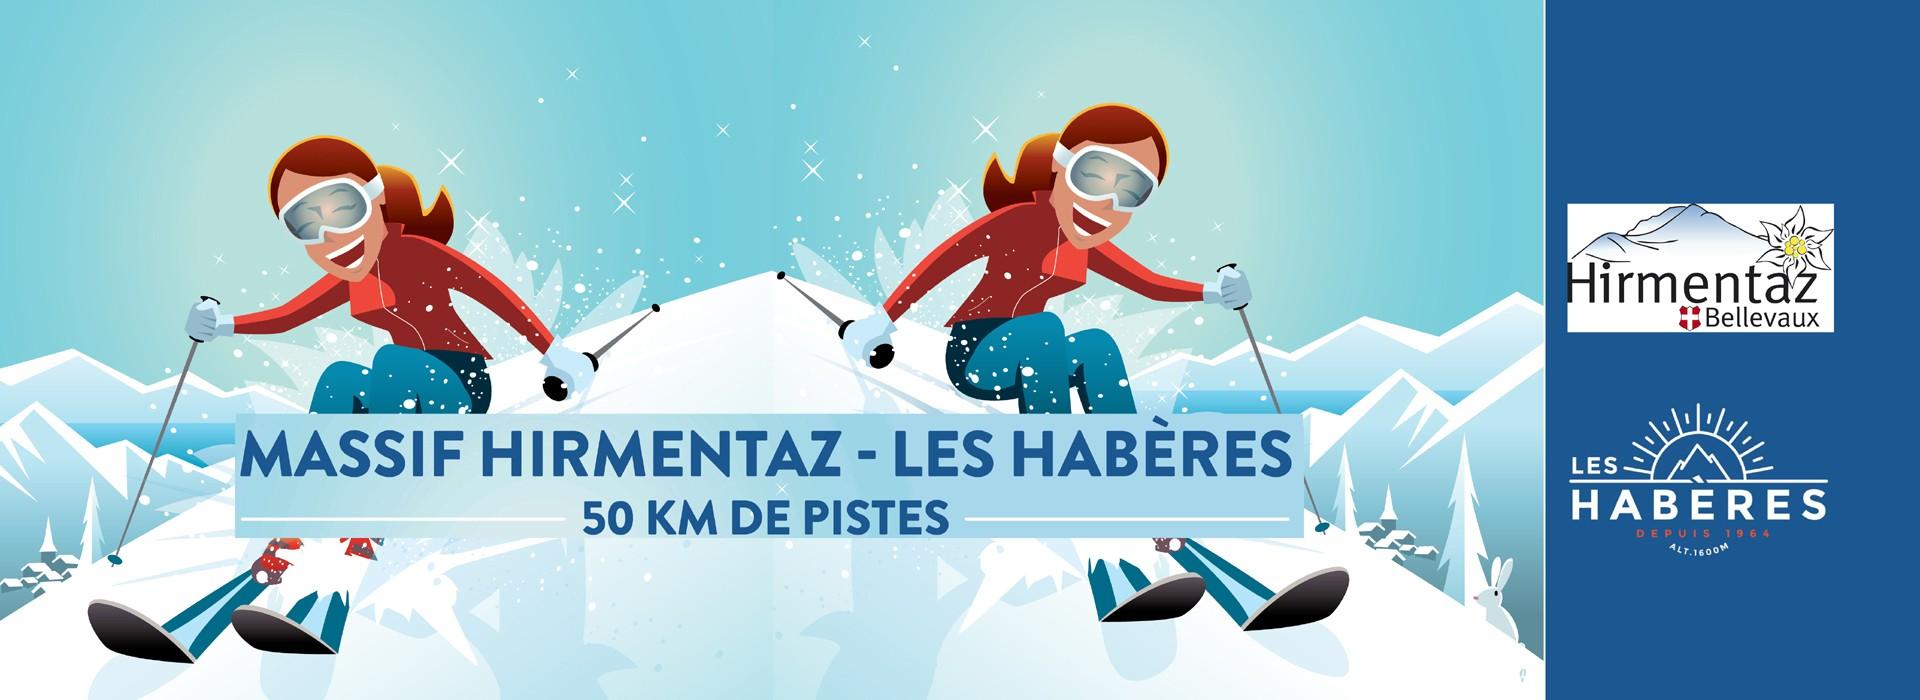 Forfaits ski achat en ligne Hirmentaz-LesHaberes